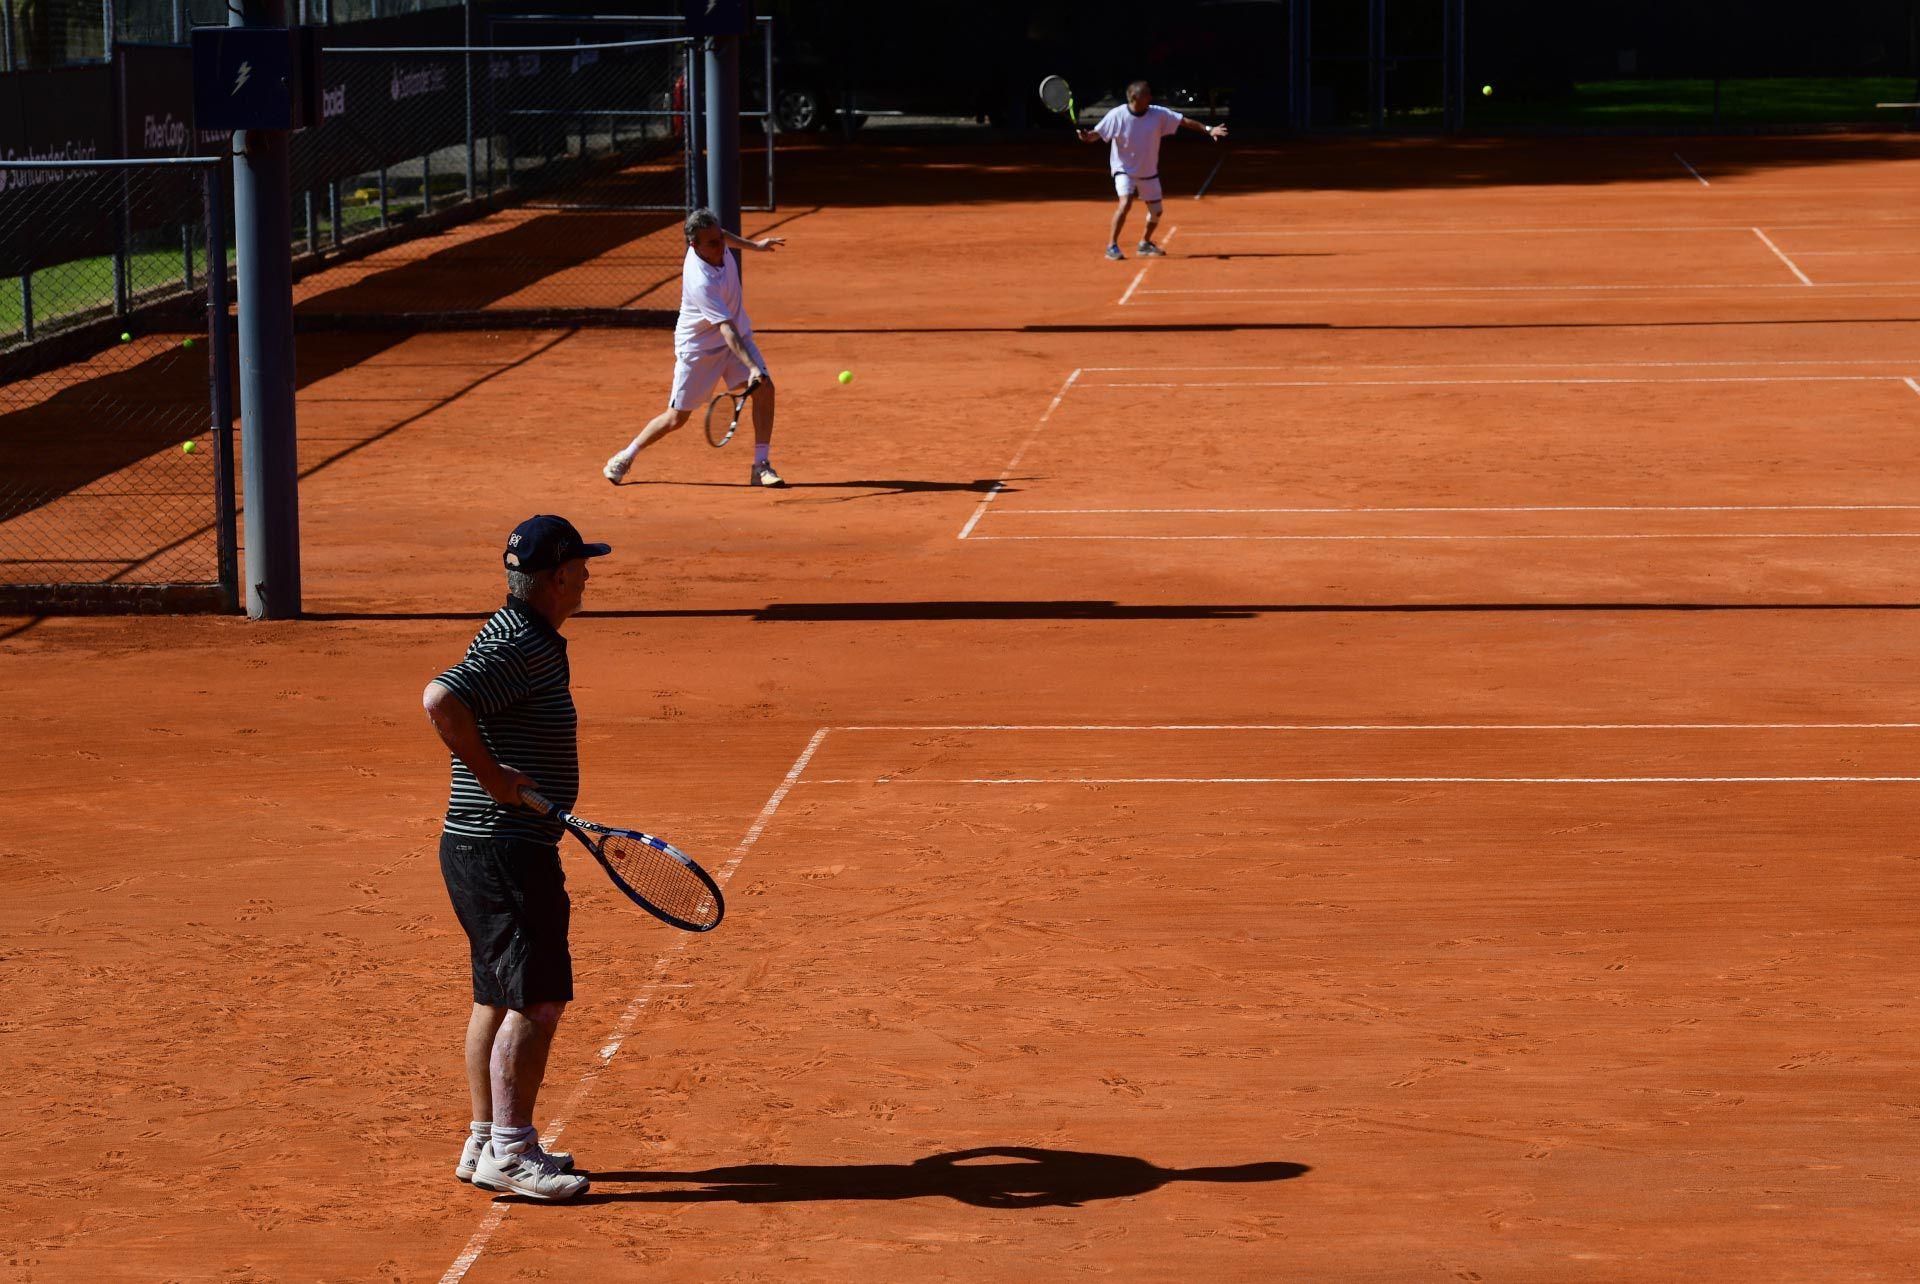 Apertura canchas de tenis